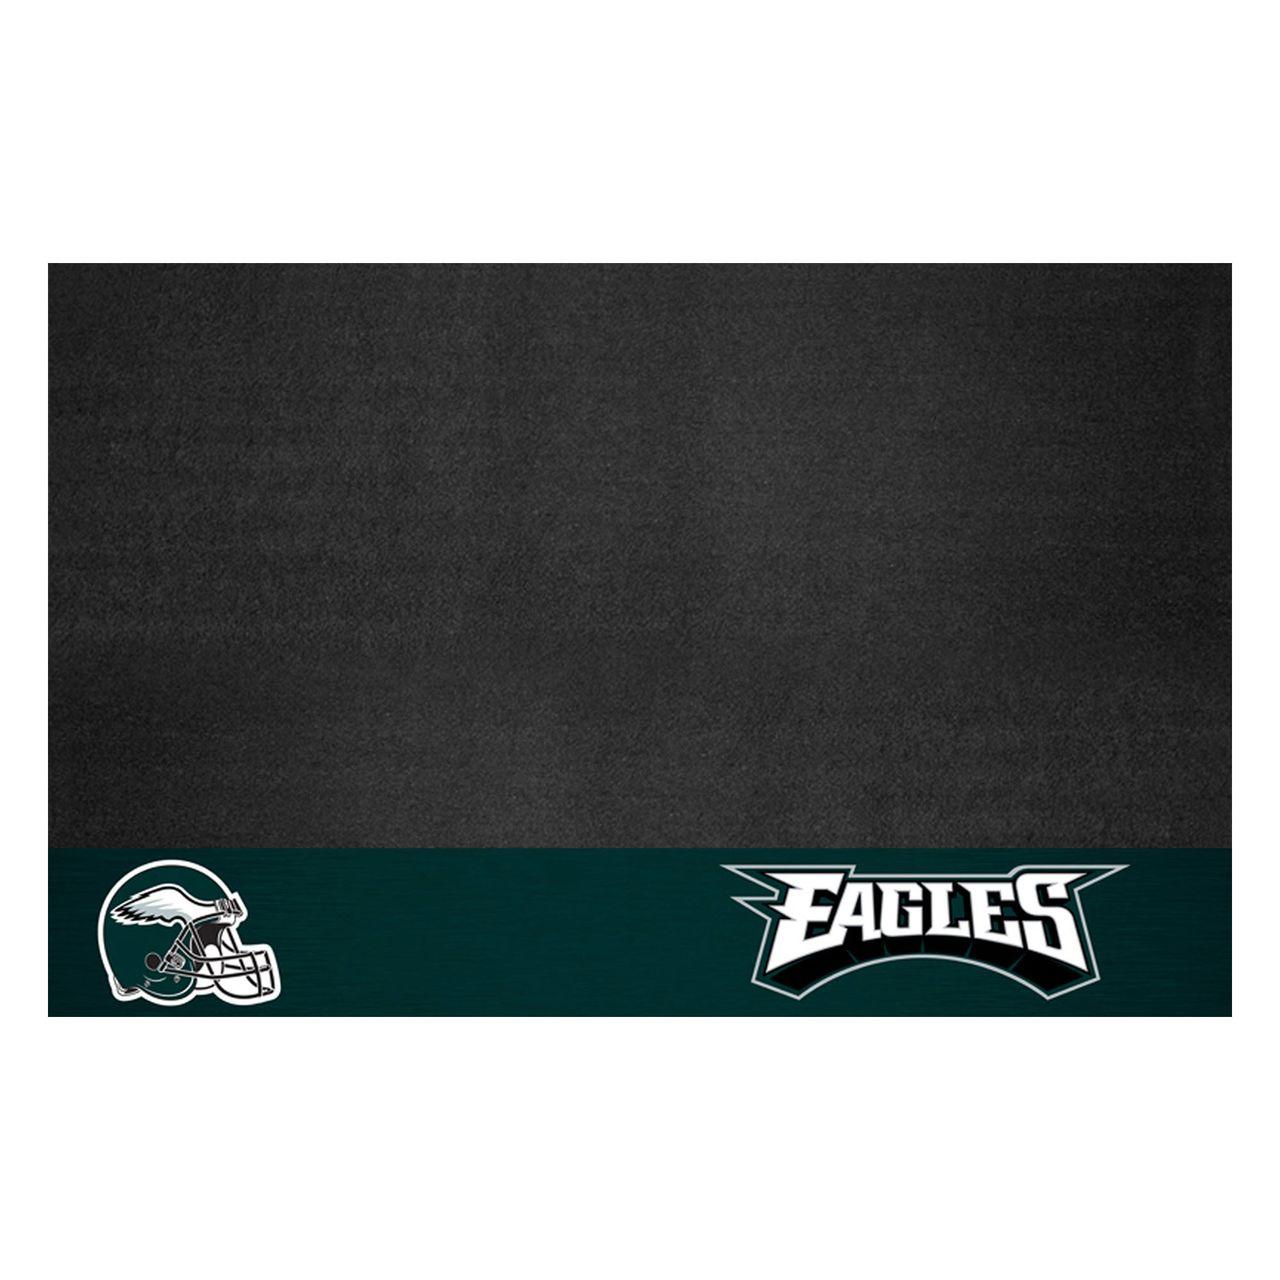 "NFL - Philadelphia Eagles Grill Mat 26"" x 42"""